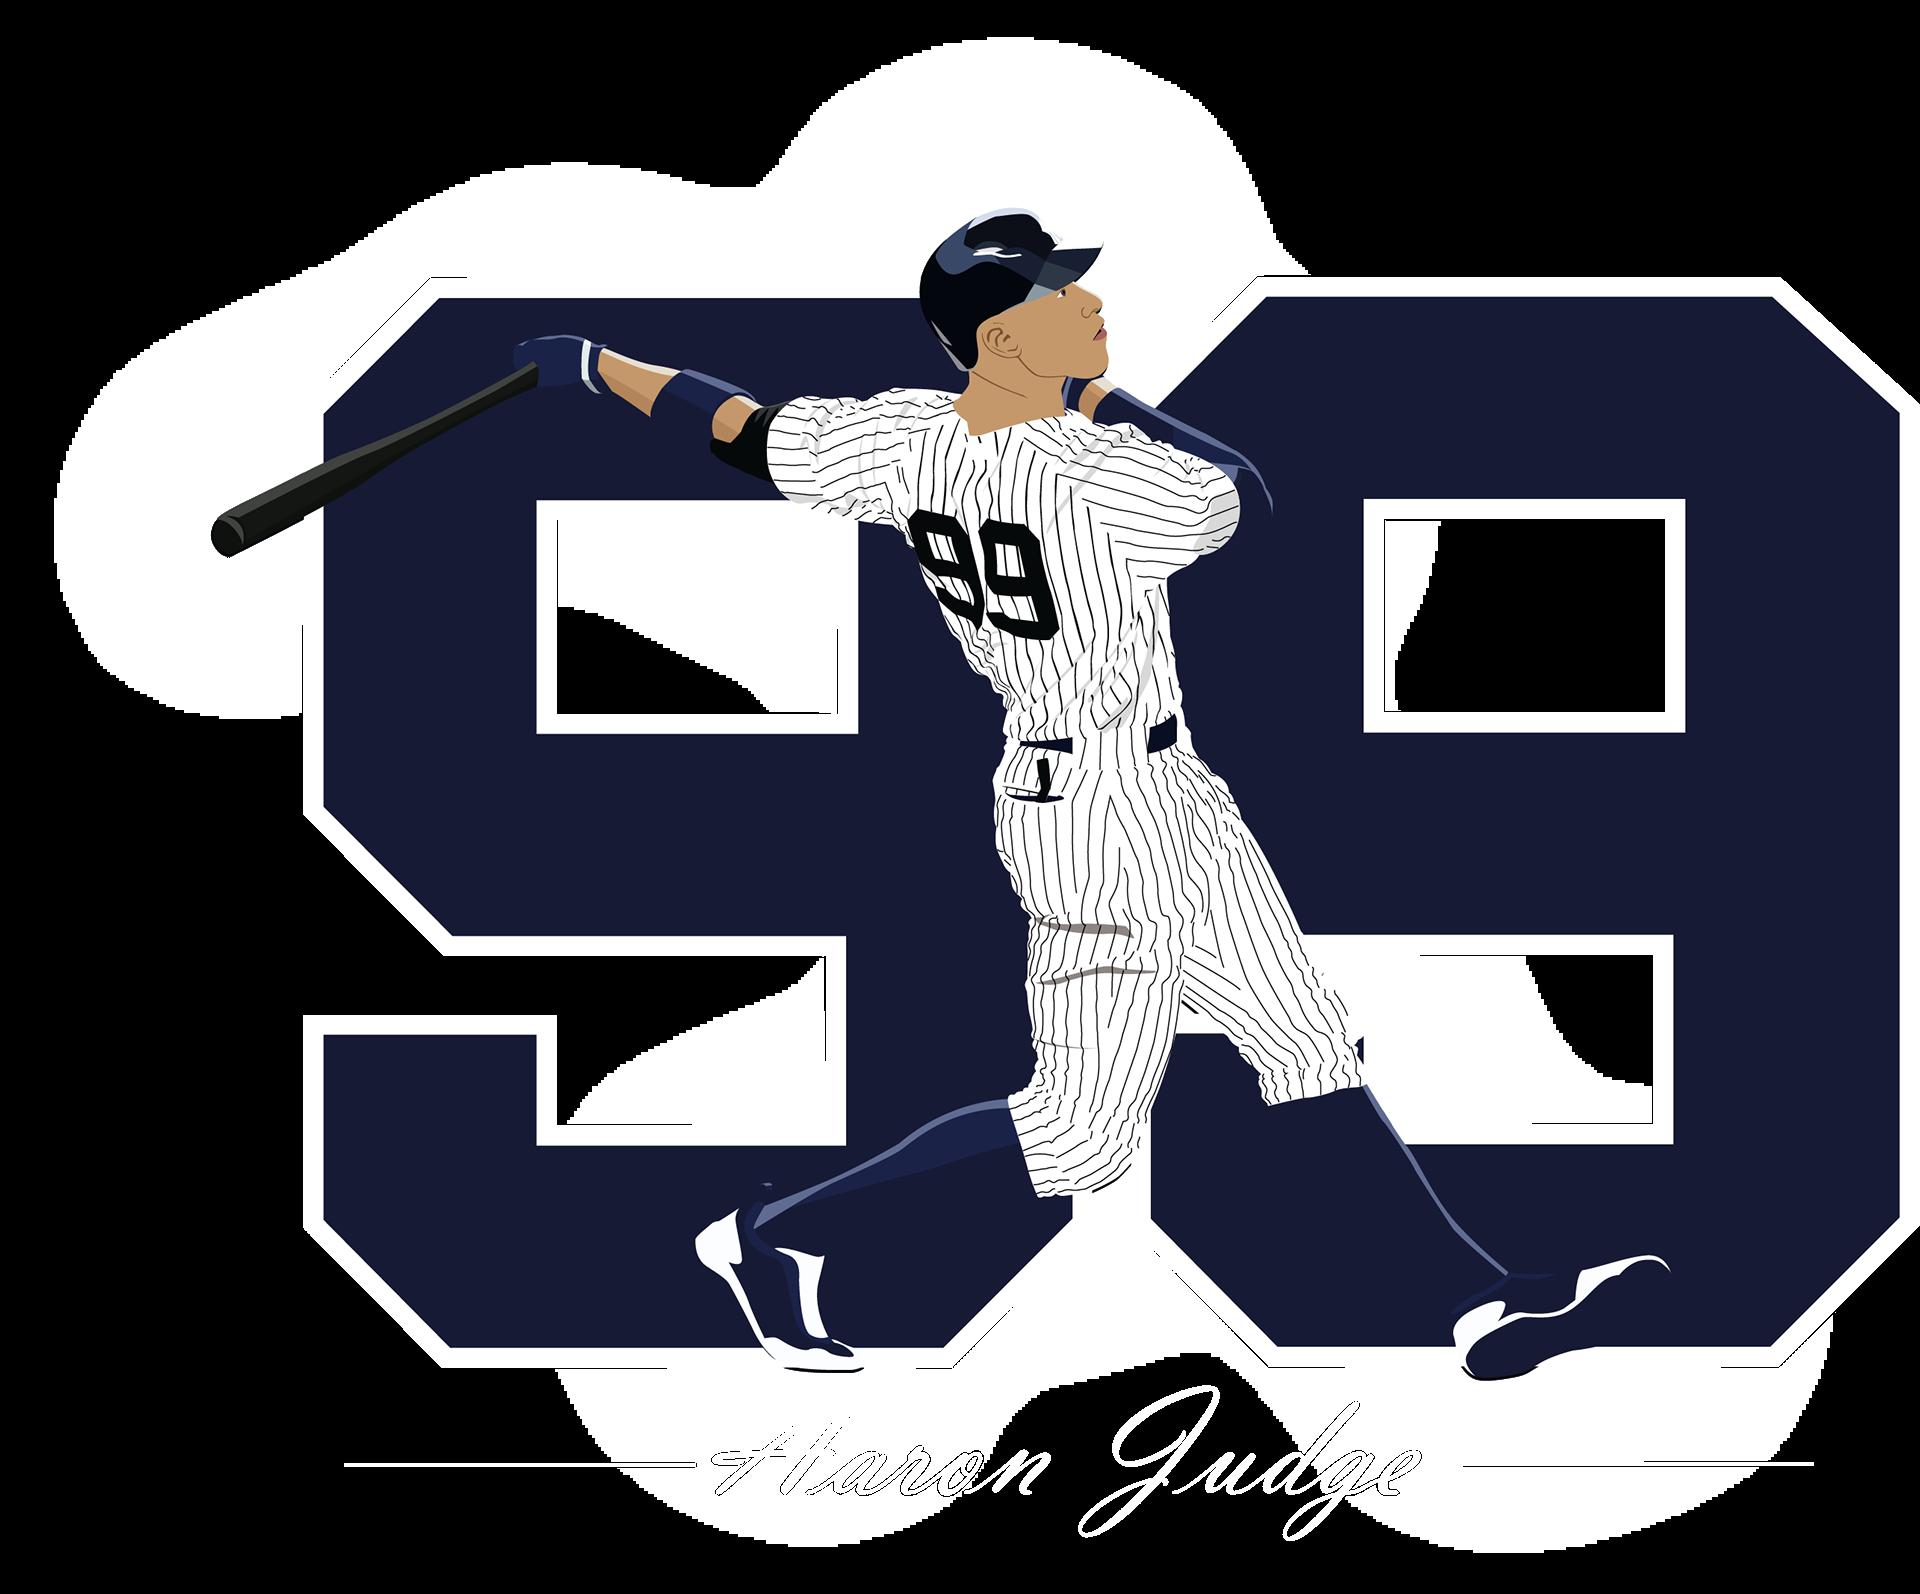 Yankees baseball clipart graphic freeuse library Murphy Miranda - Aaron Judge 99 Illustration graphic freeuse library